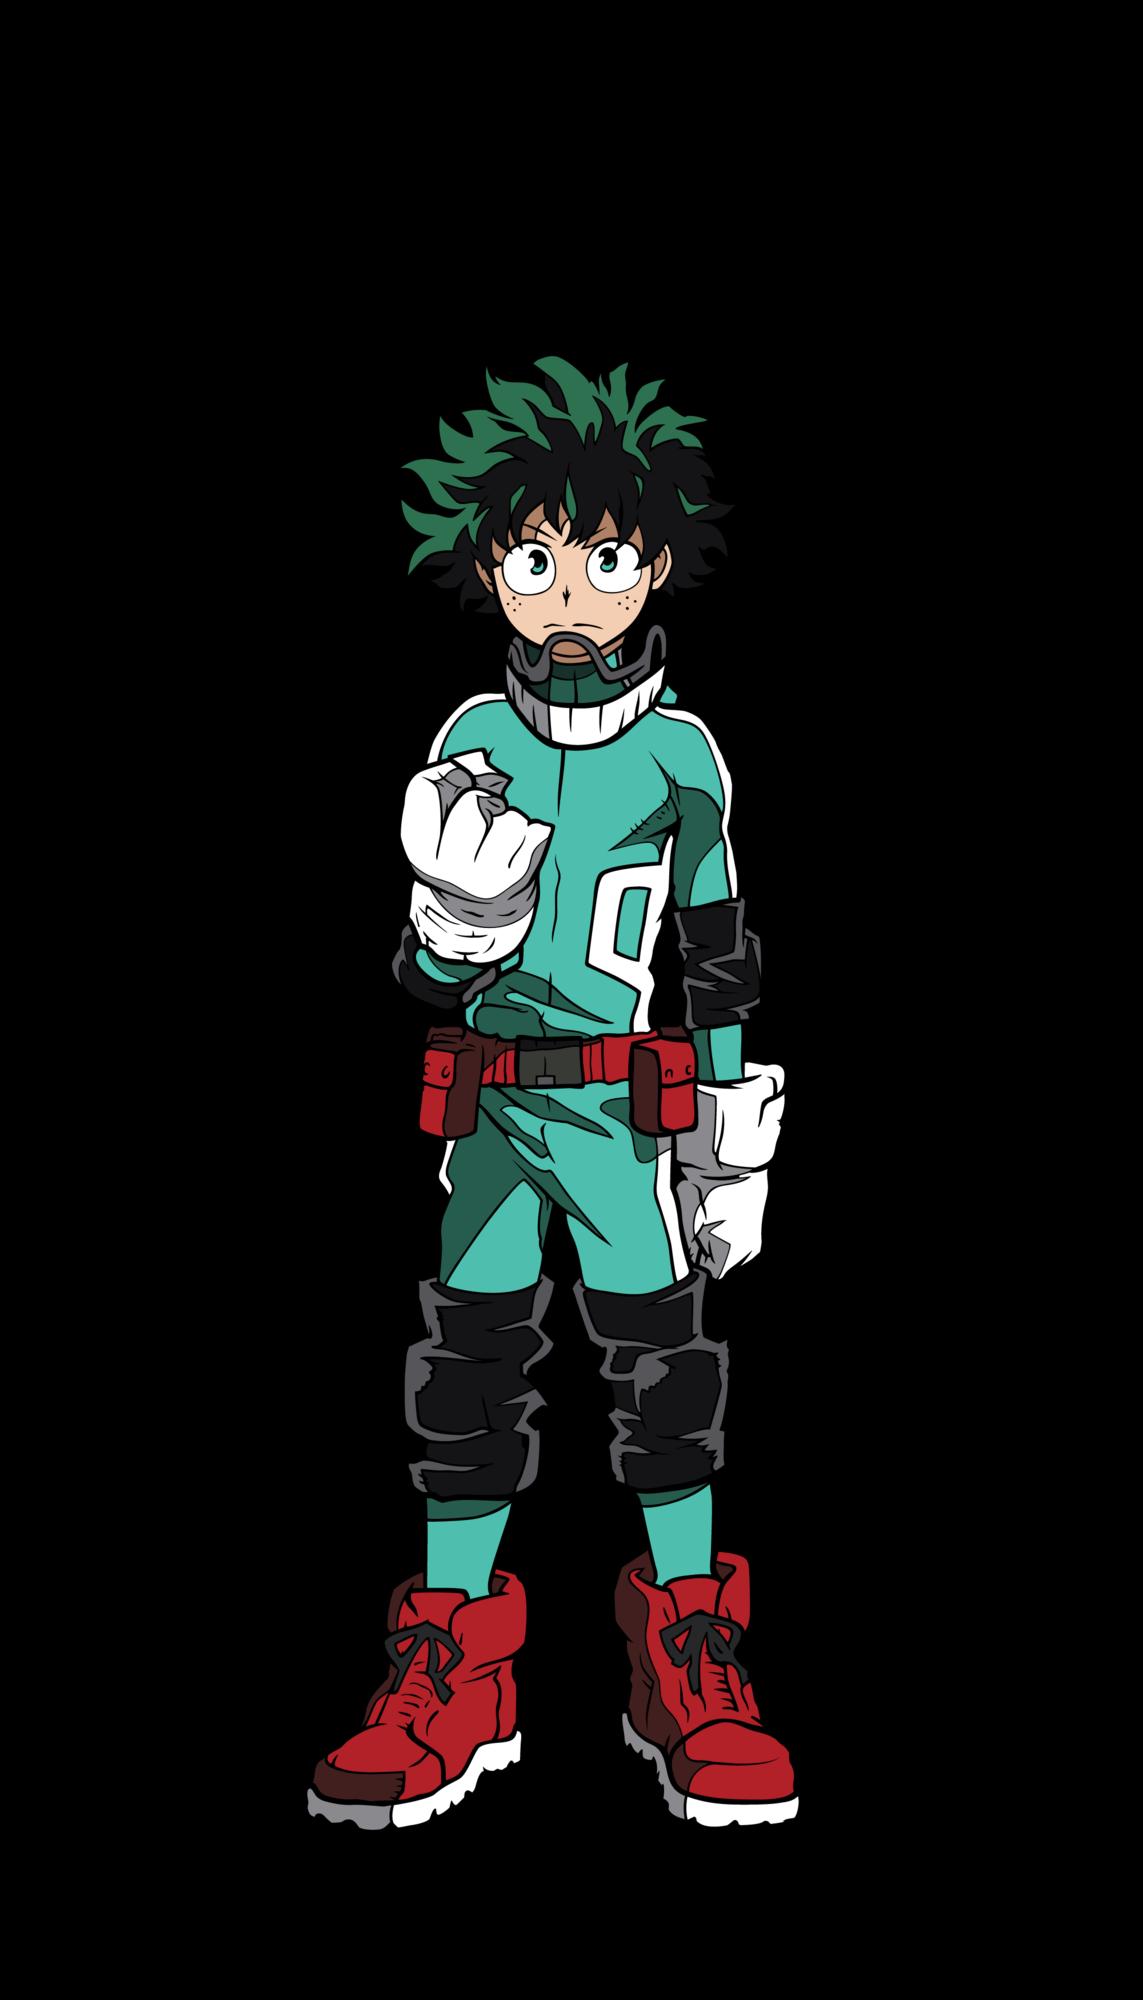 png free download My Hero Academia Izuku Midoriya Enamel Pin